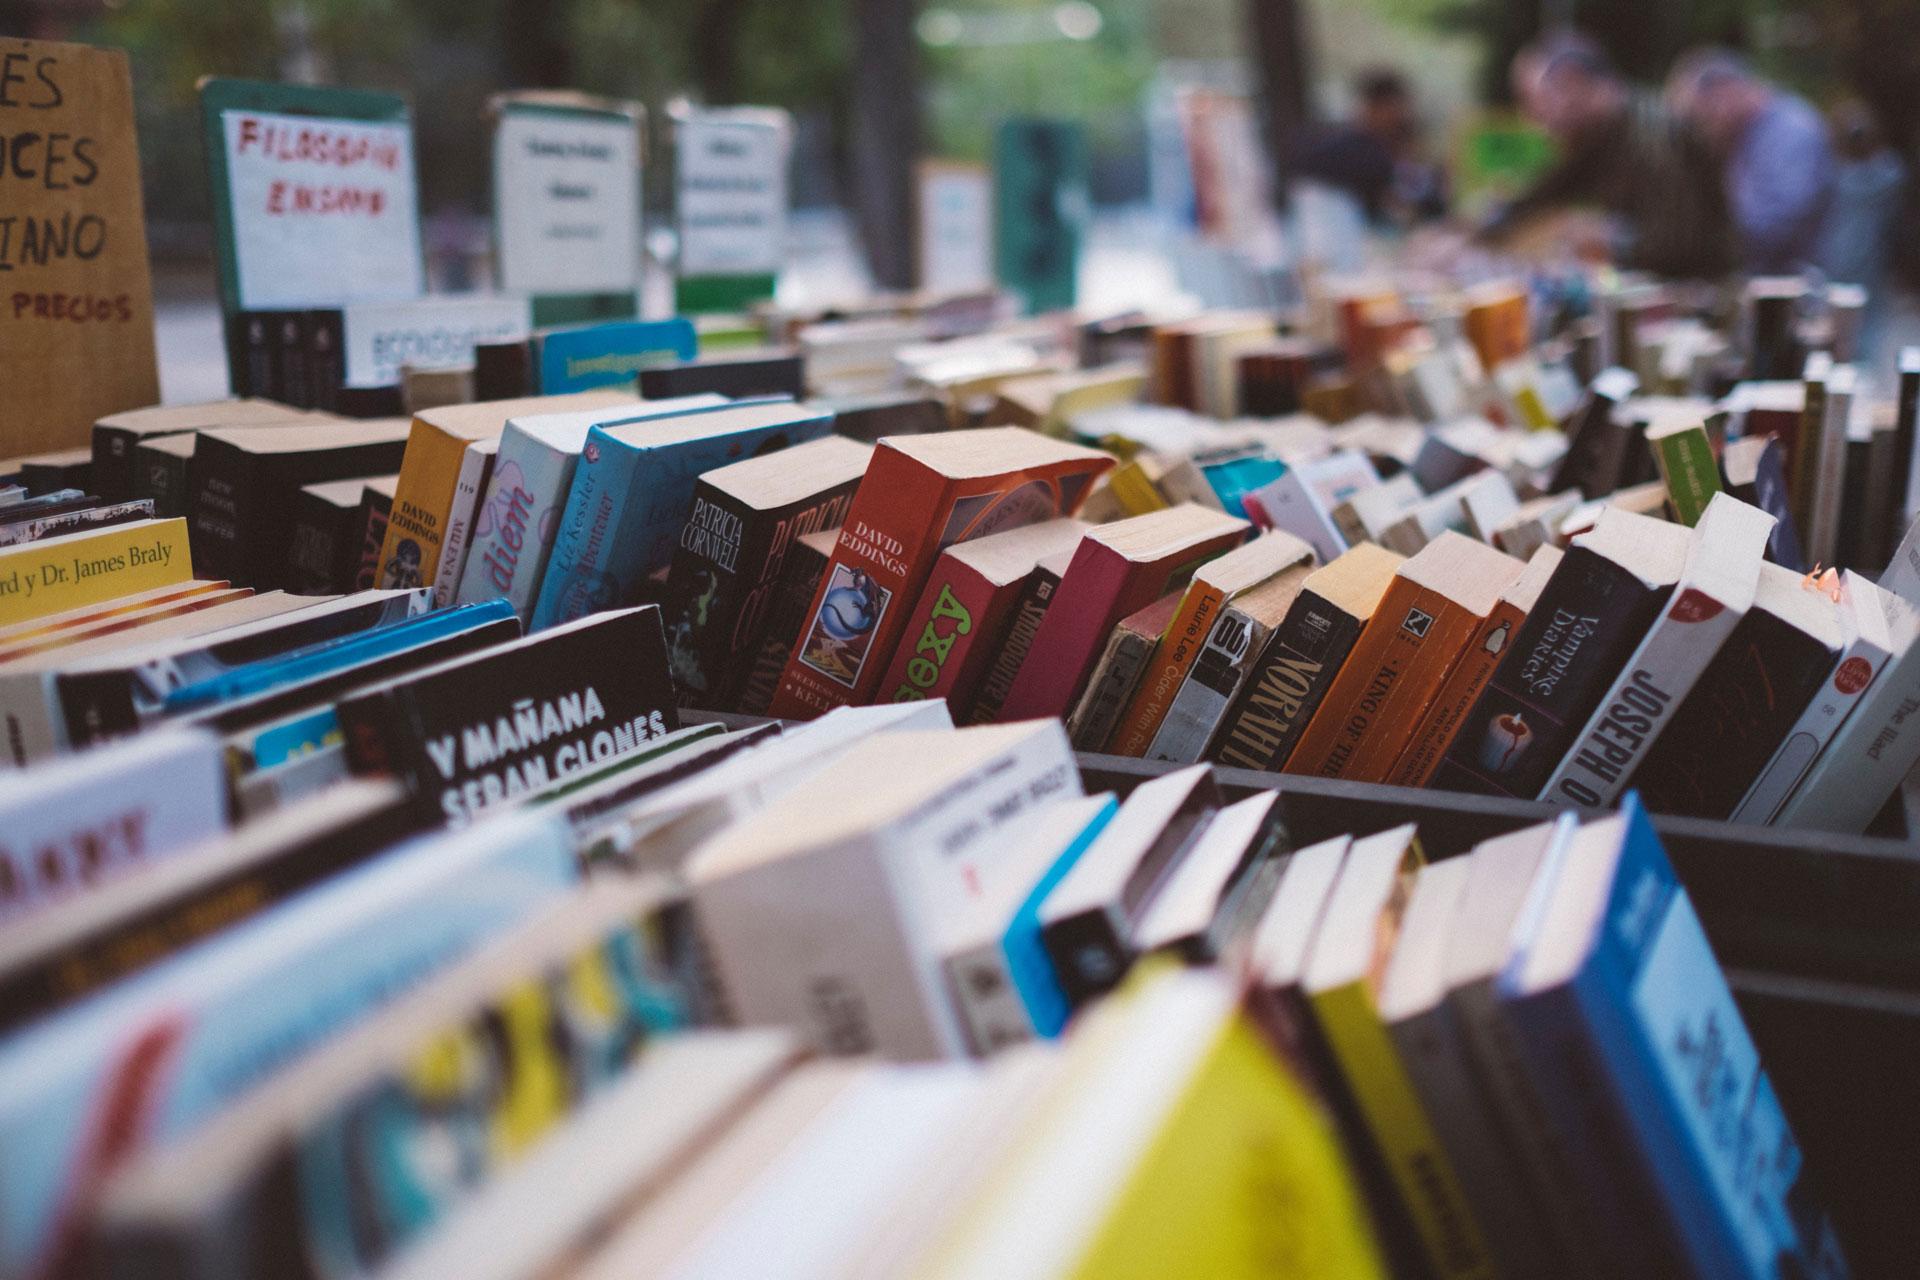 Agenzia letteraria maestri e margherite servizi